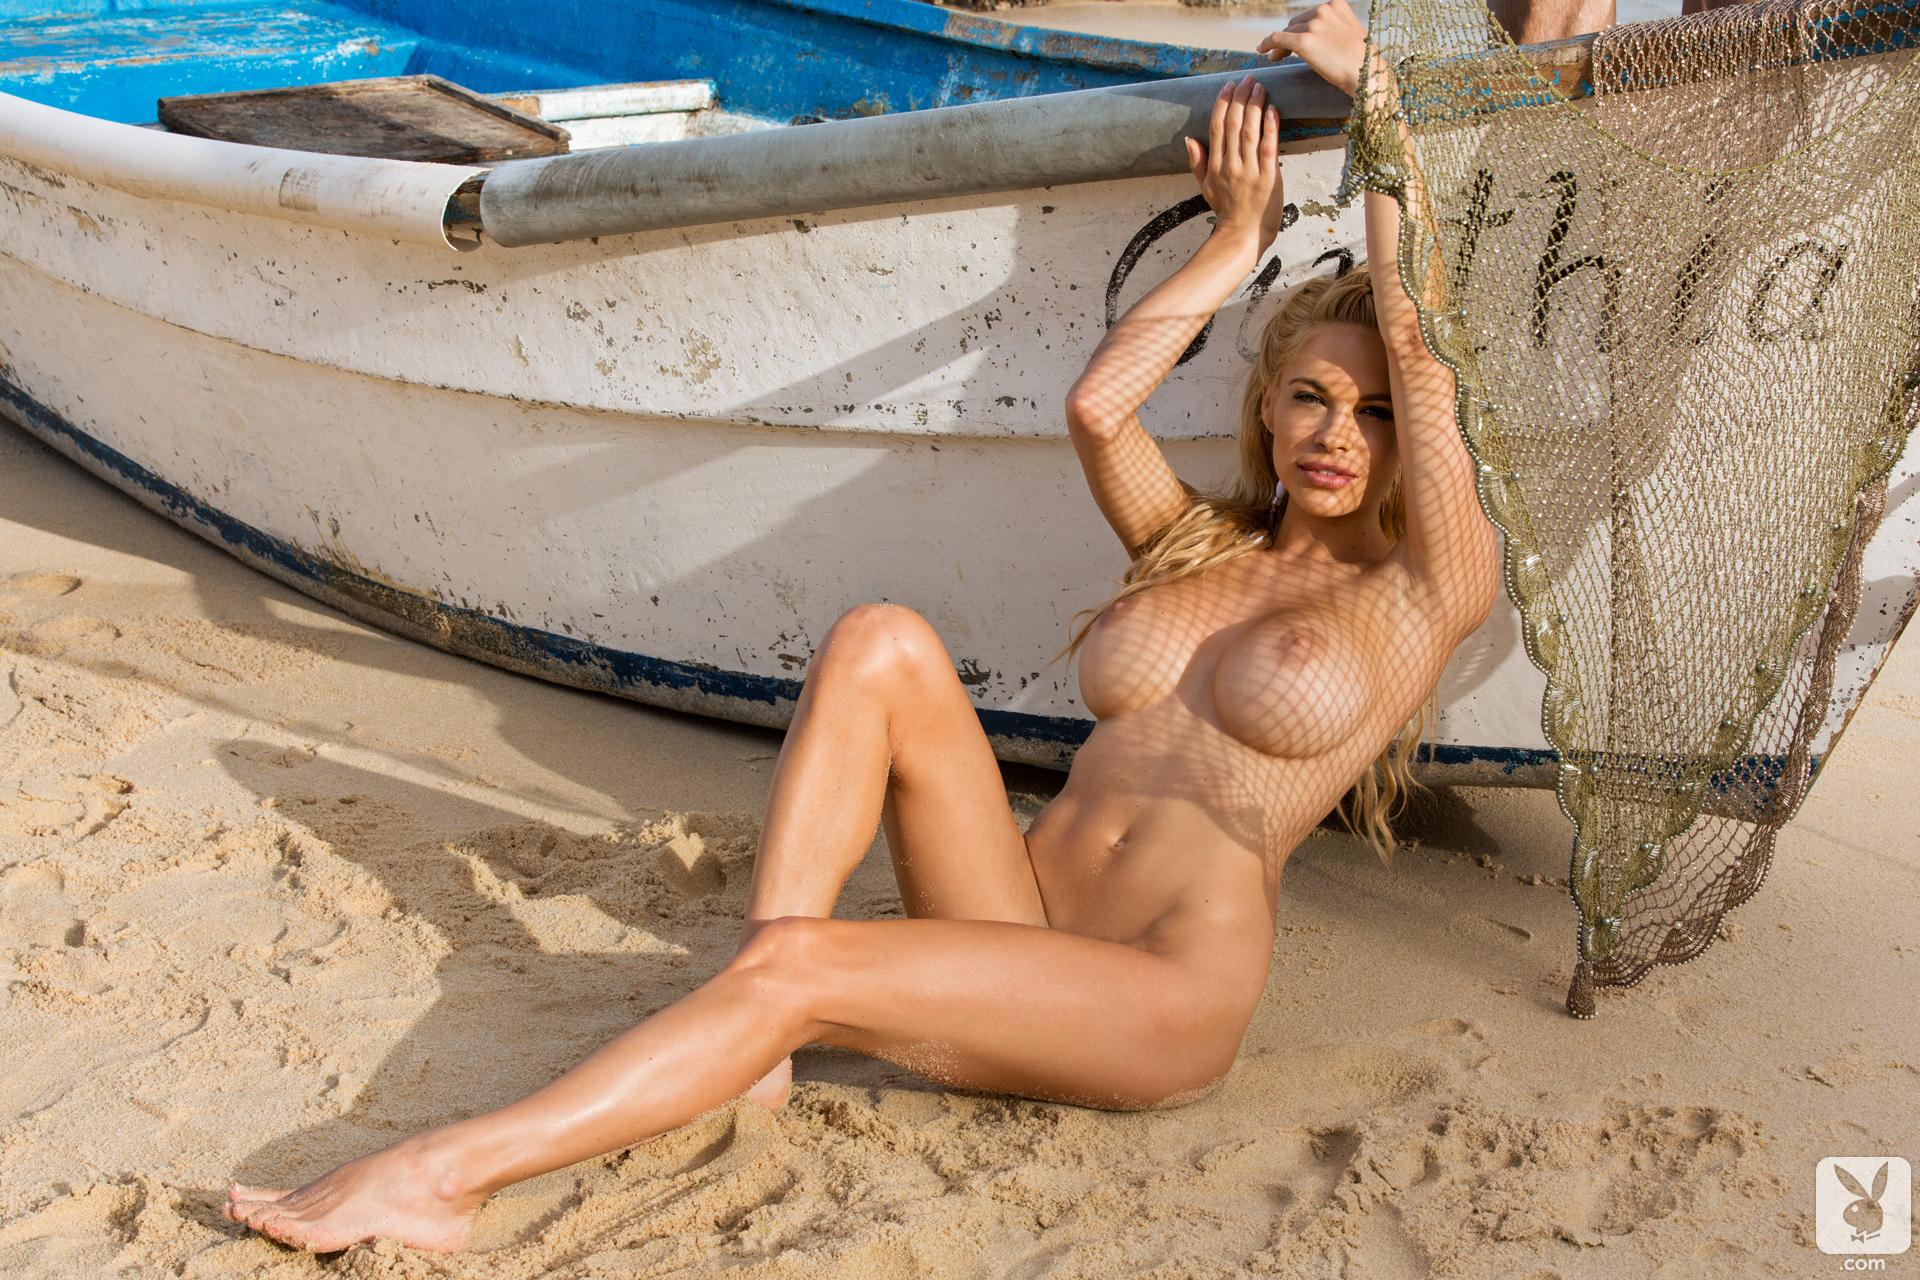 dani-mathers-beach-nude-playboy-20